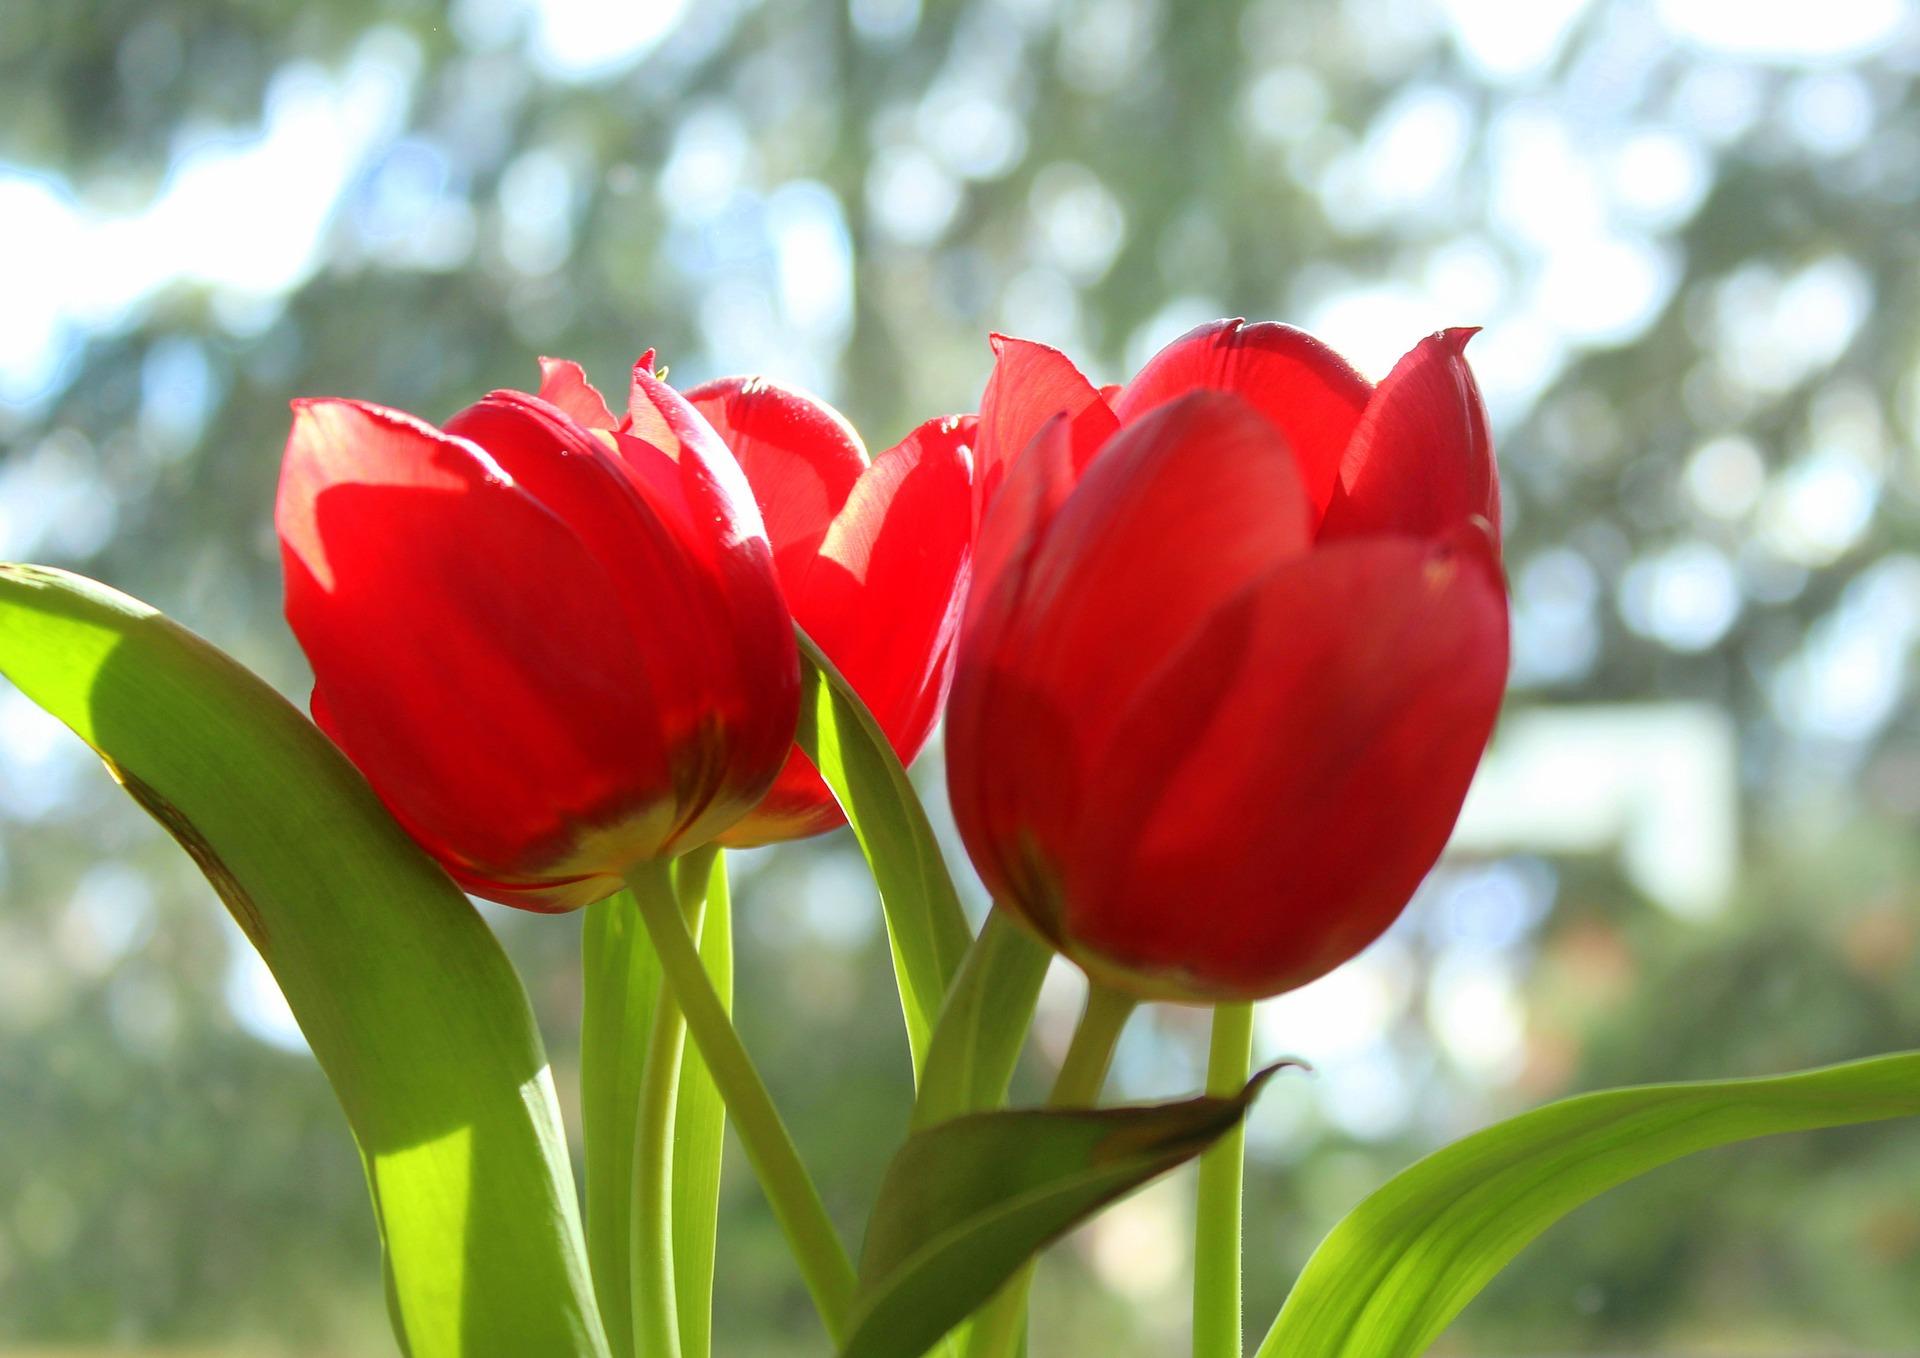 Tulips 4064896 1920